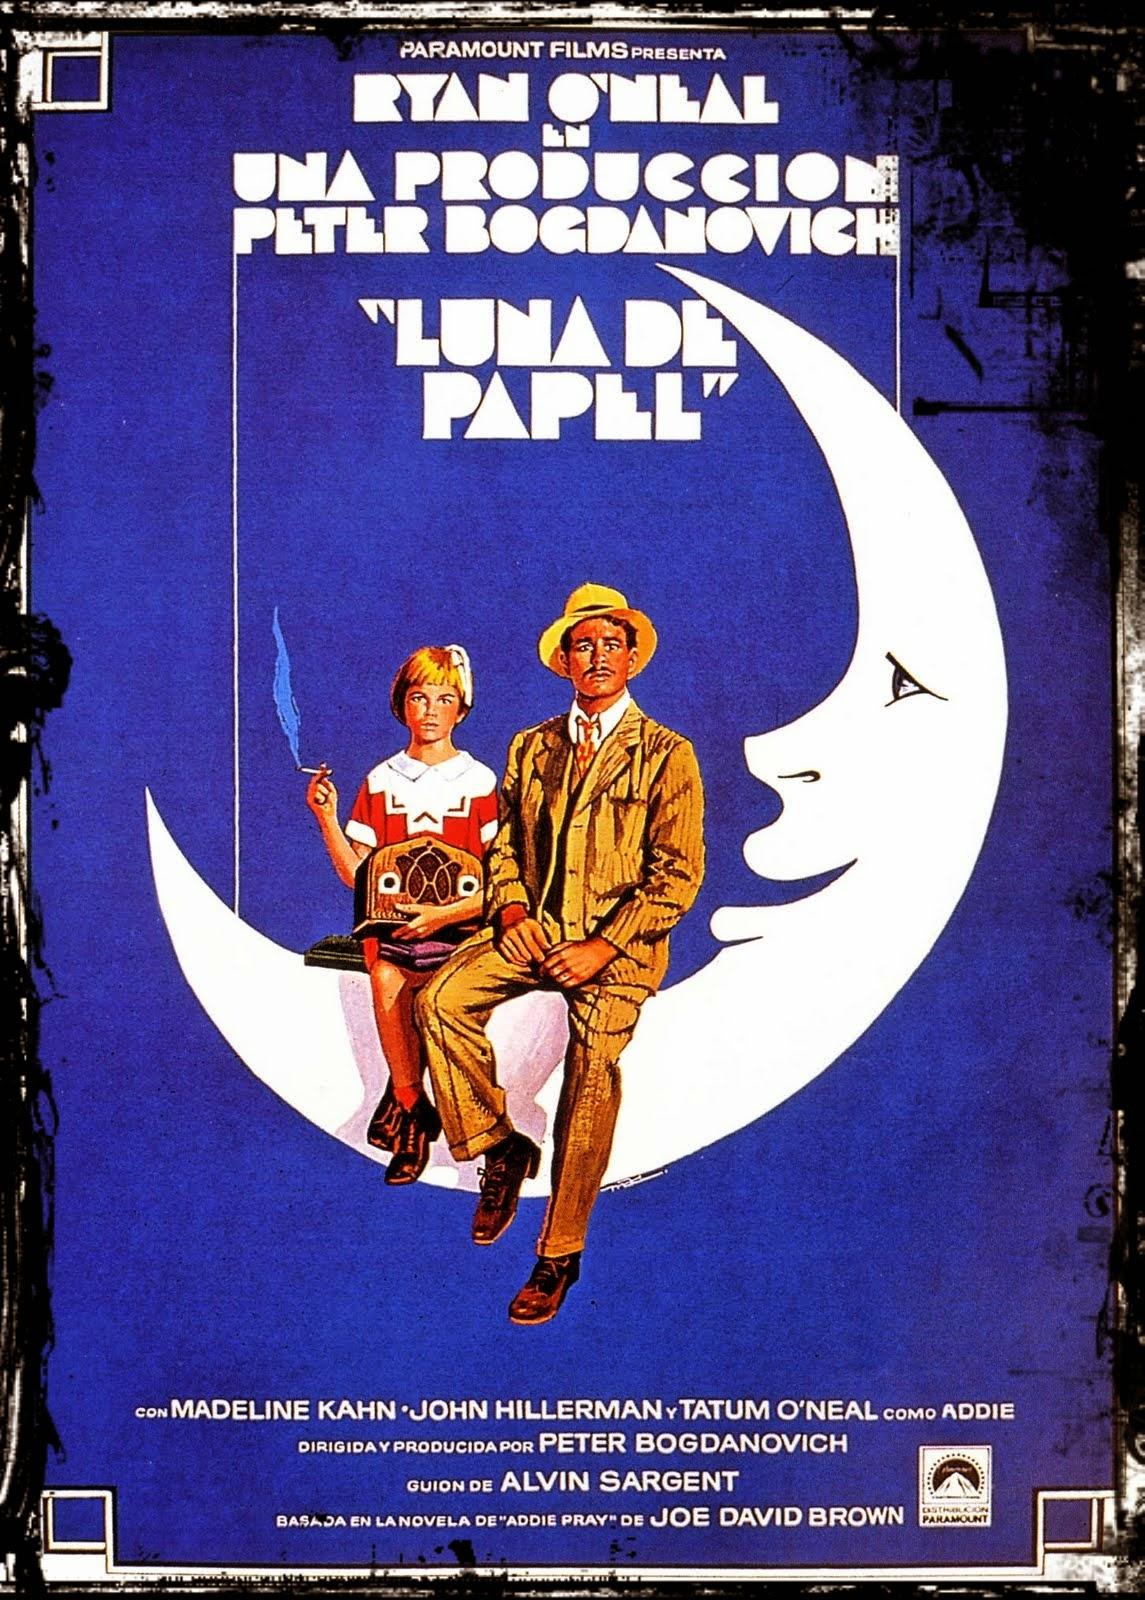 Luna, papel, Peter, Bogdanovich